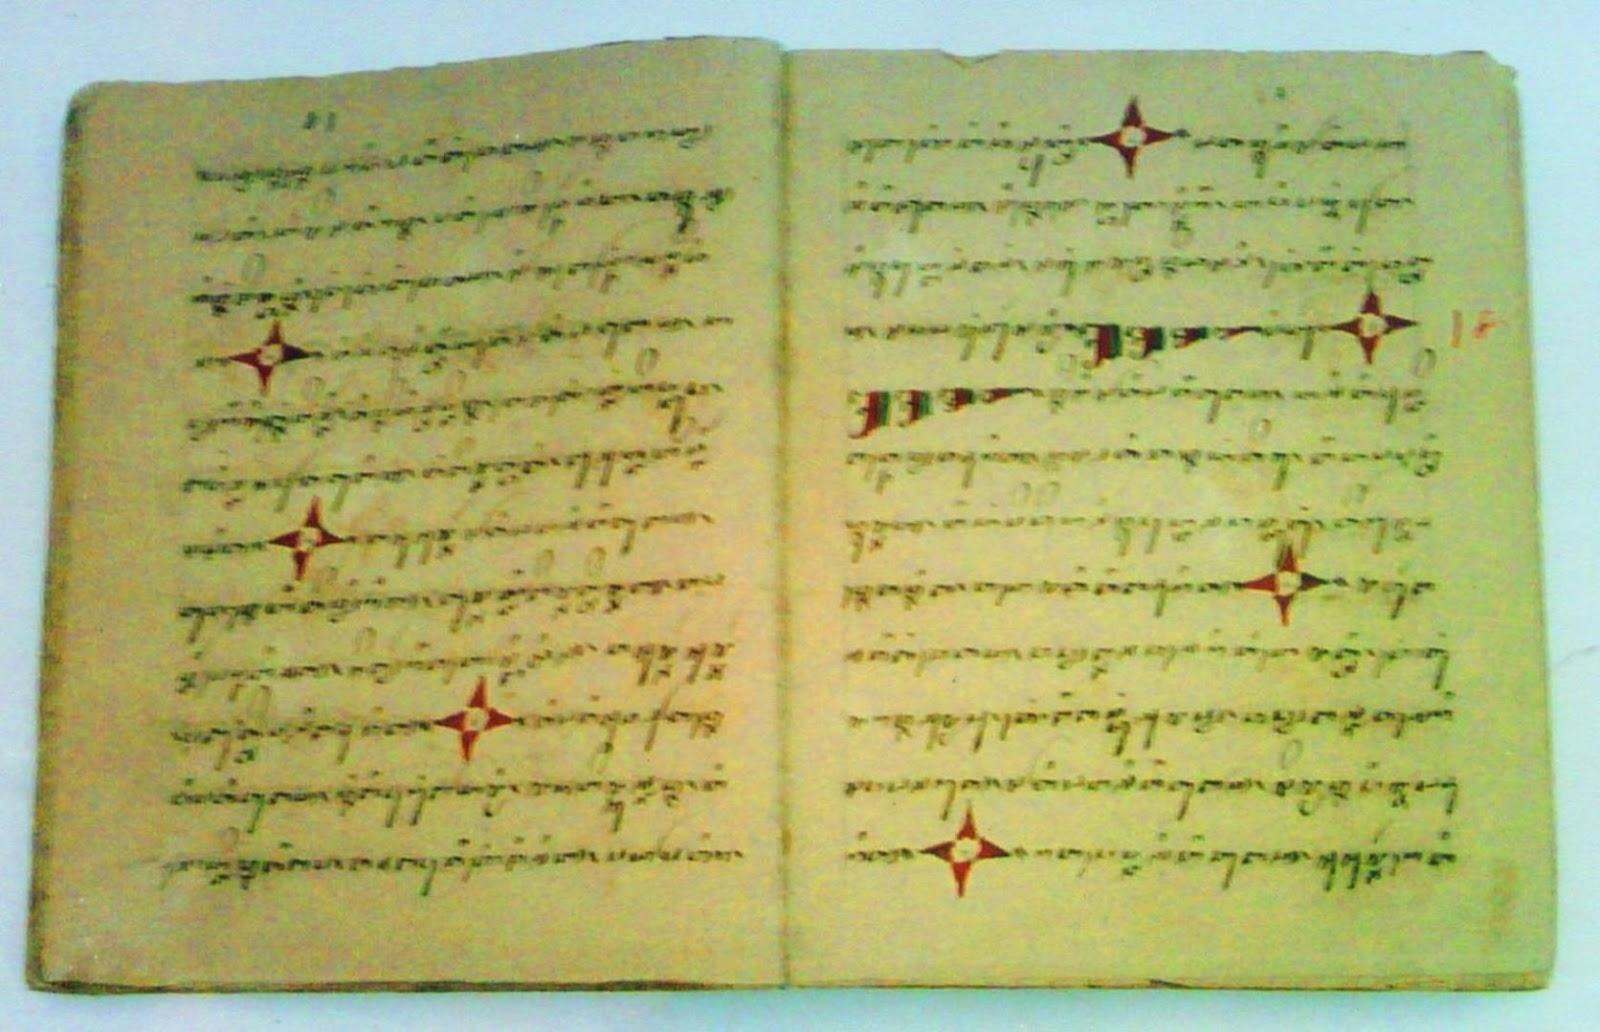 beberapa tulisan jawa kuno asli indonesia   Kaskus - The Largest ...